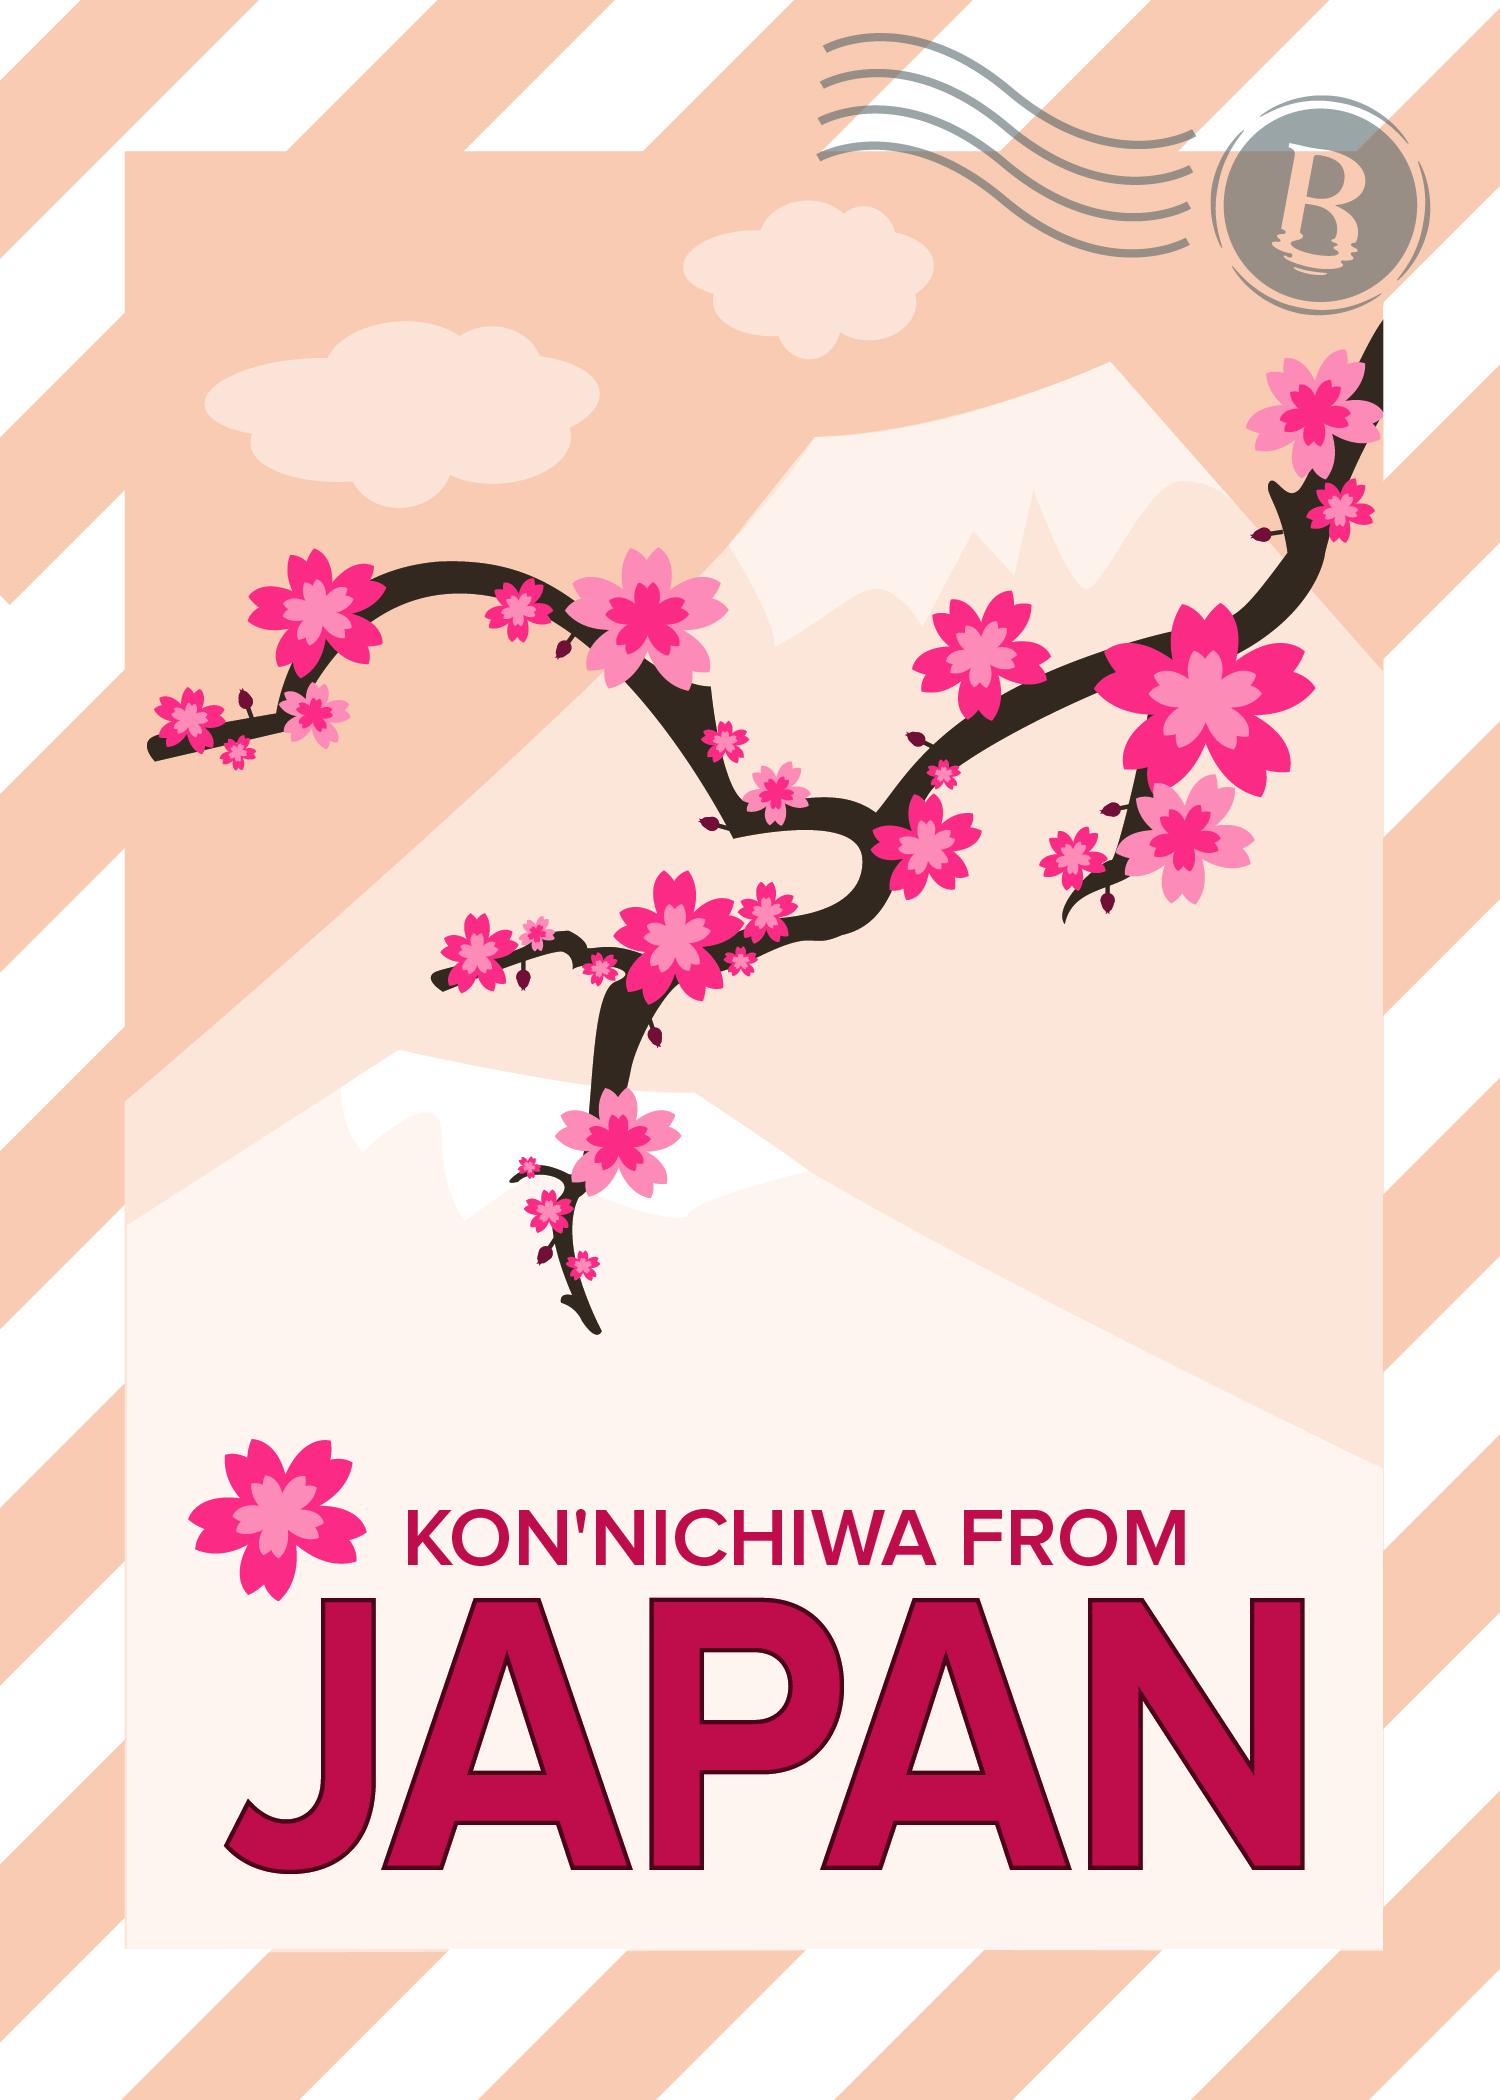 JapanPostcard